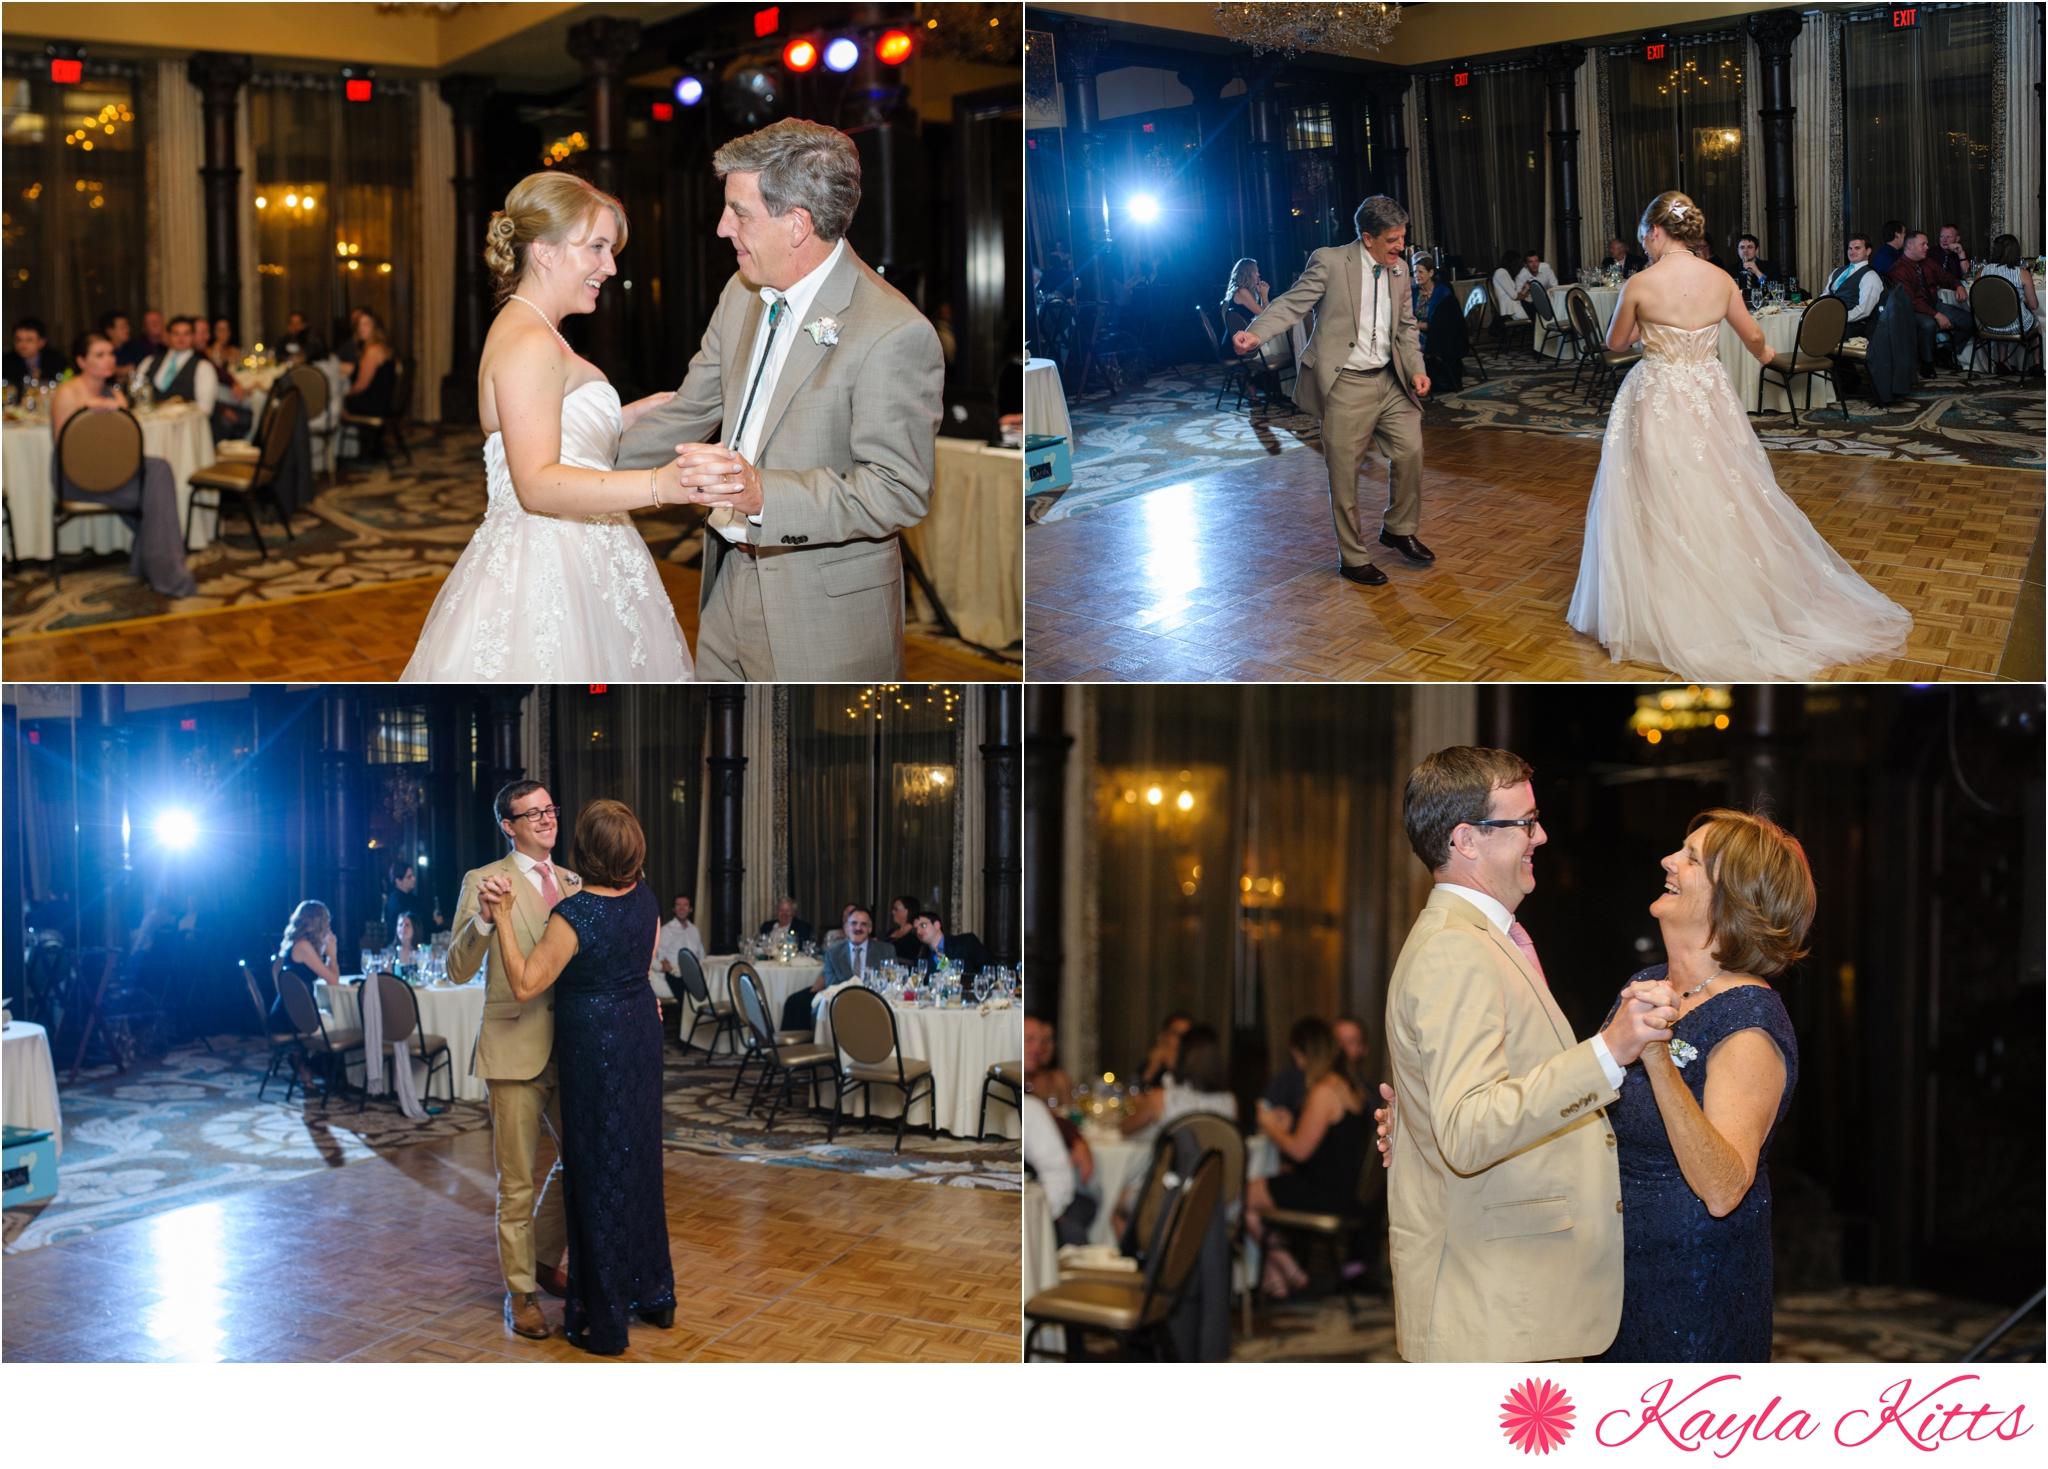 albuquerque wedding photographer - taos wedding - el monte sagrado wedding - new mexico wedding - alfred angelo dress - origami favors